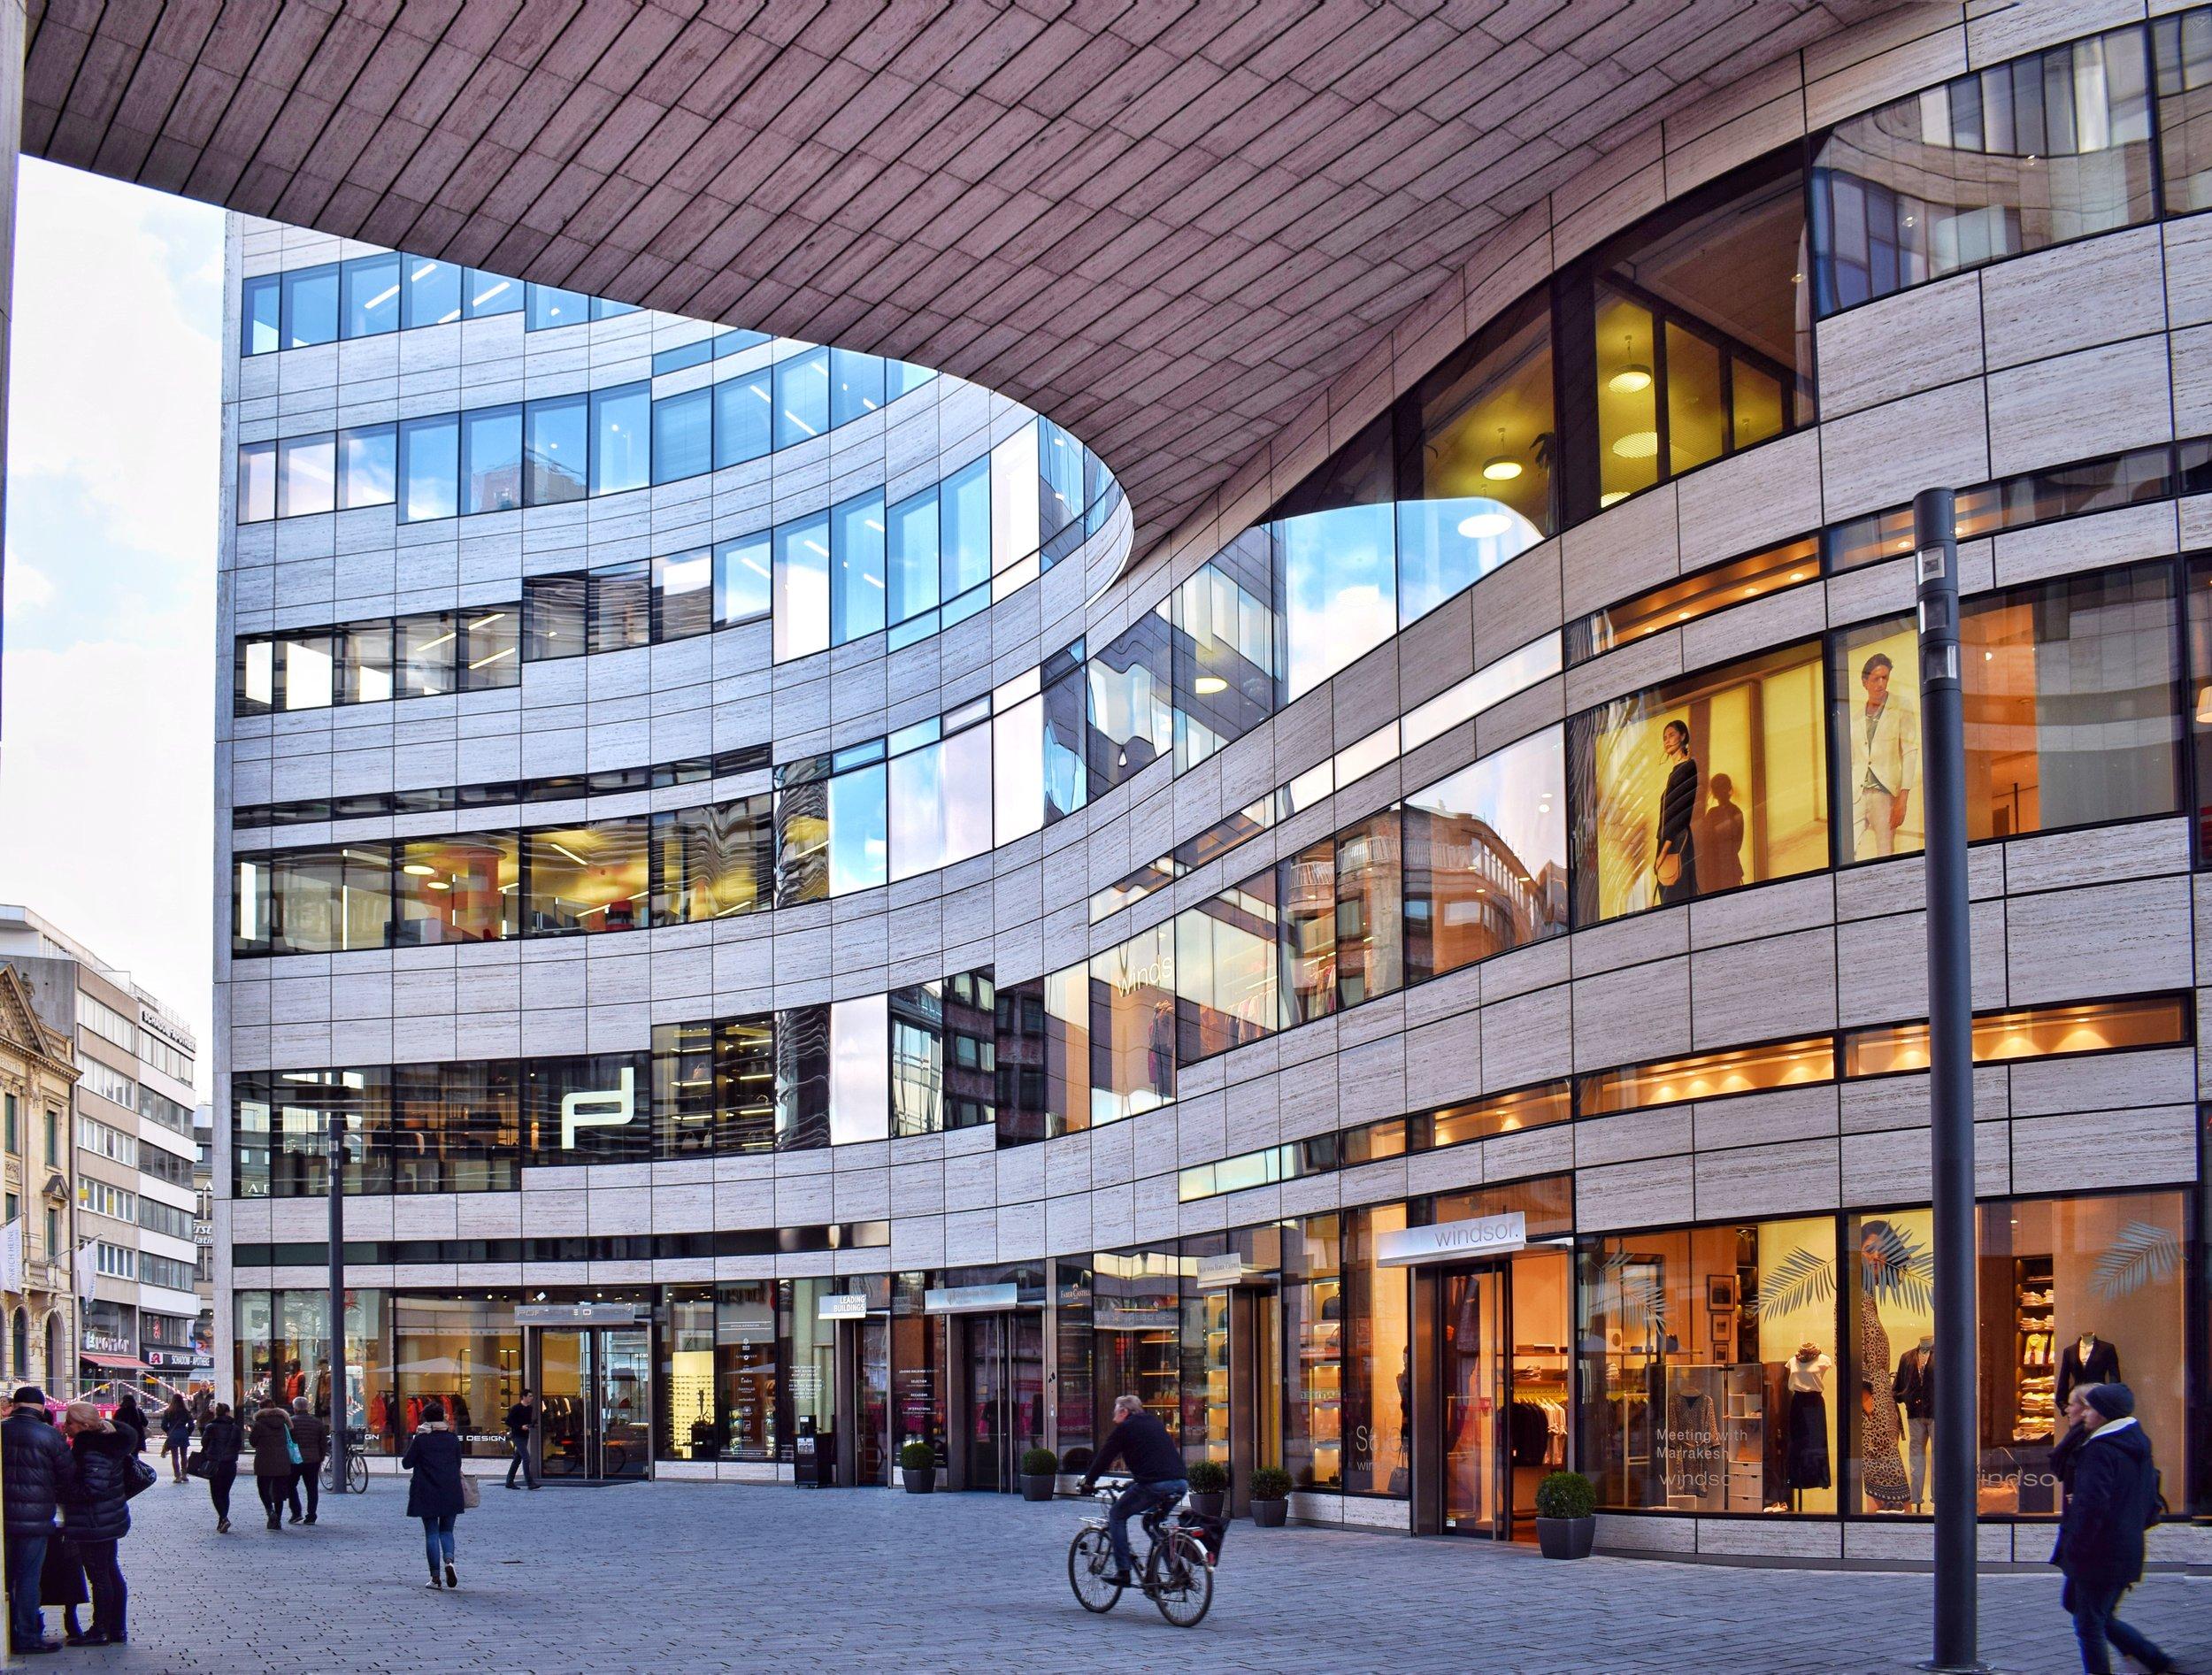 Daniel-Libeskind-Dusseldorf-Brown-Leather-Book